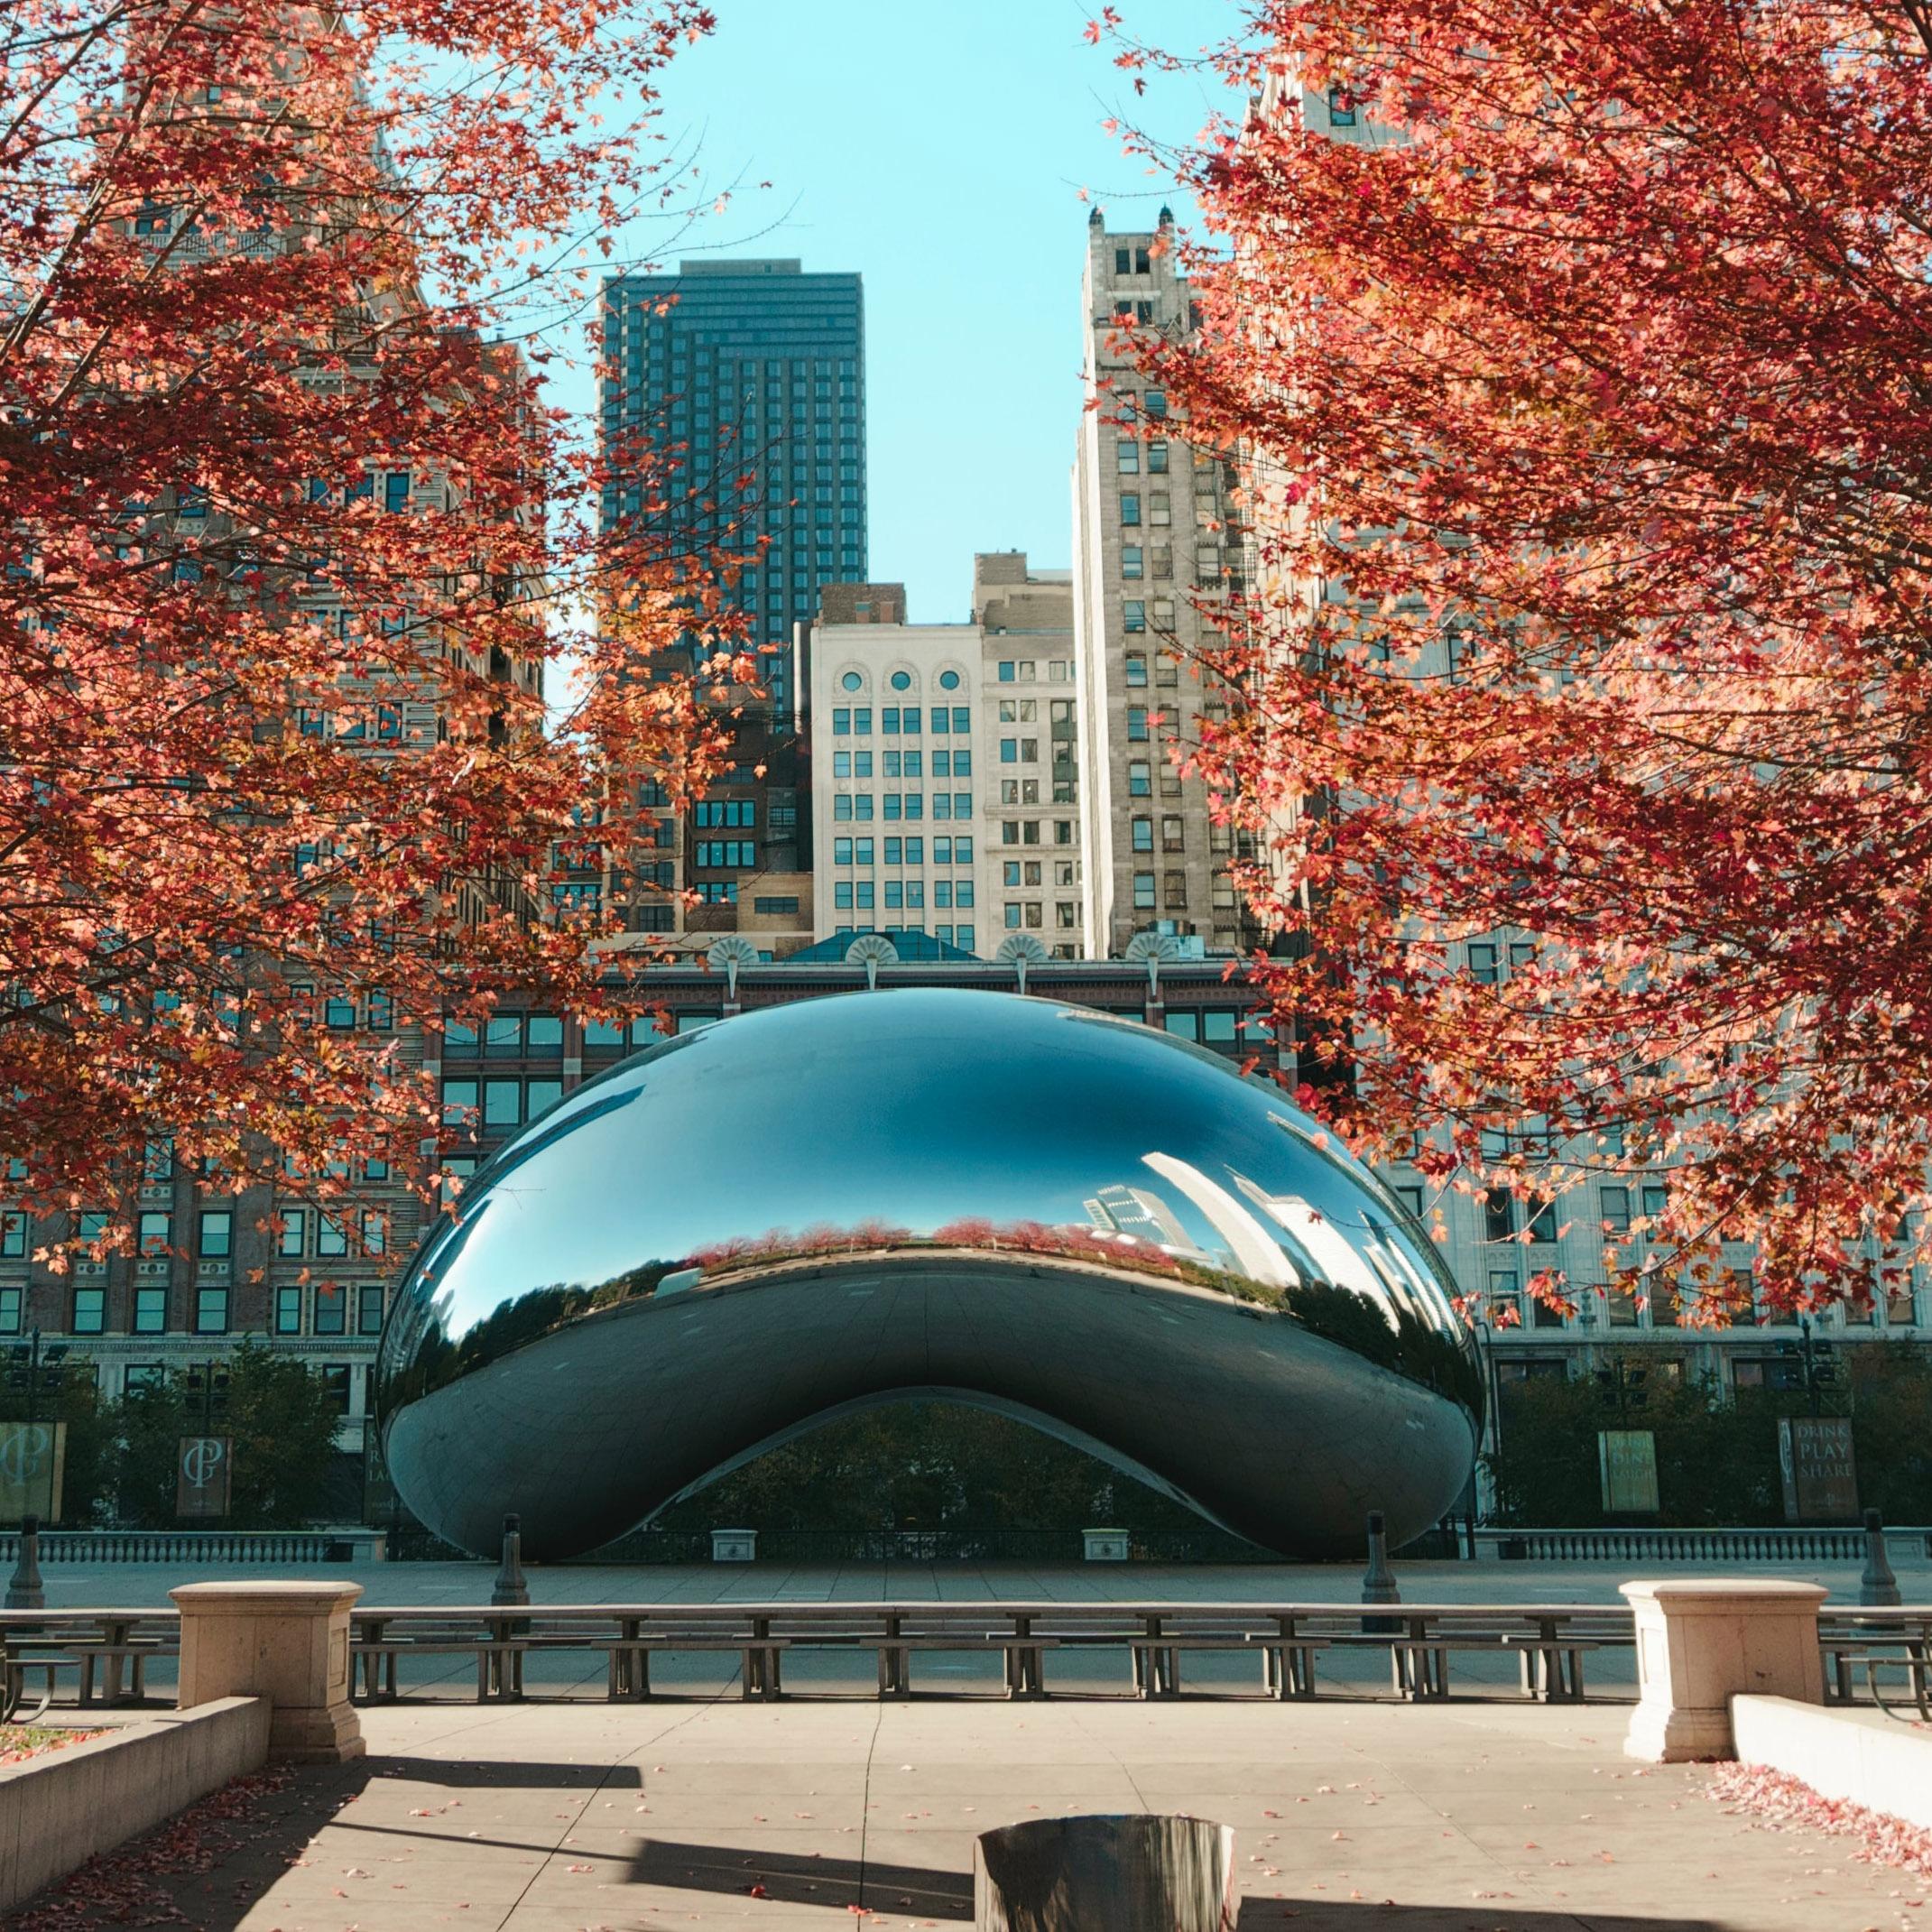 Photo of the Chicago Loop neighborhood in autumn